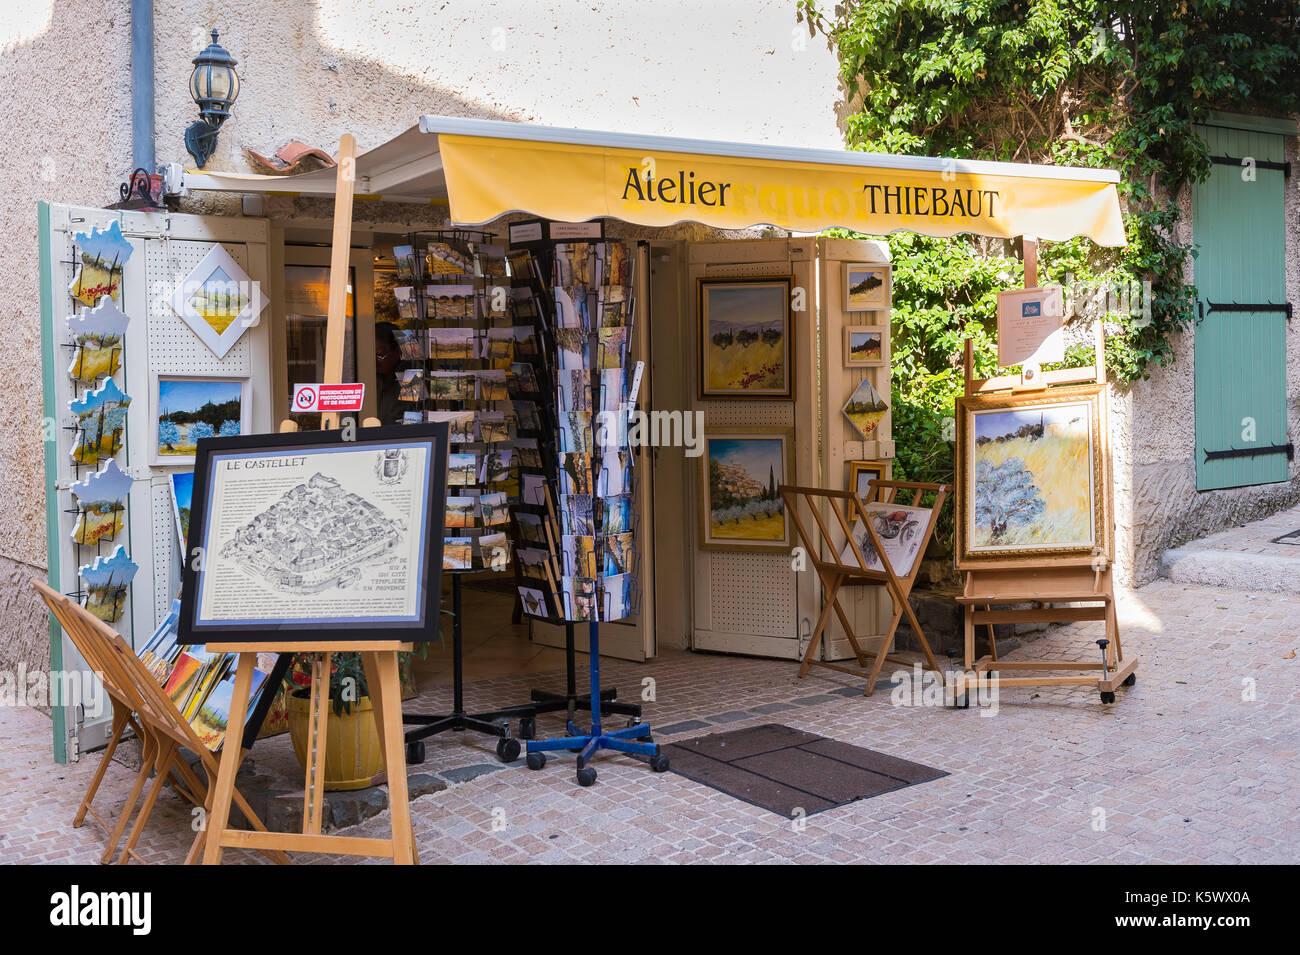 Atelier Artiste Peintre Thiebaut  Village Medieval du Castellet Var France - Stock Image